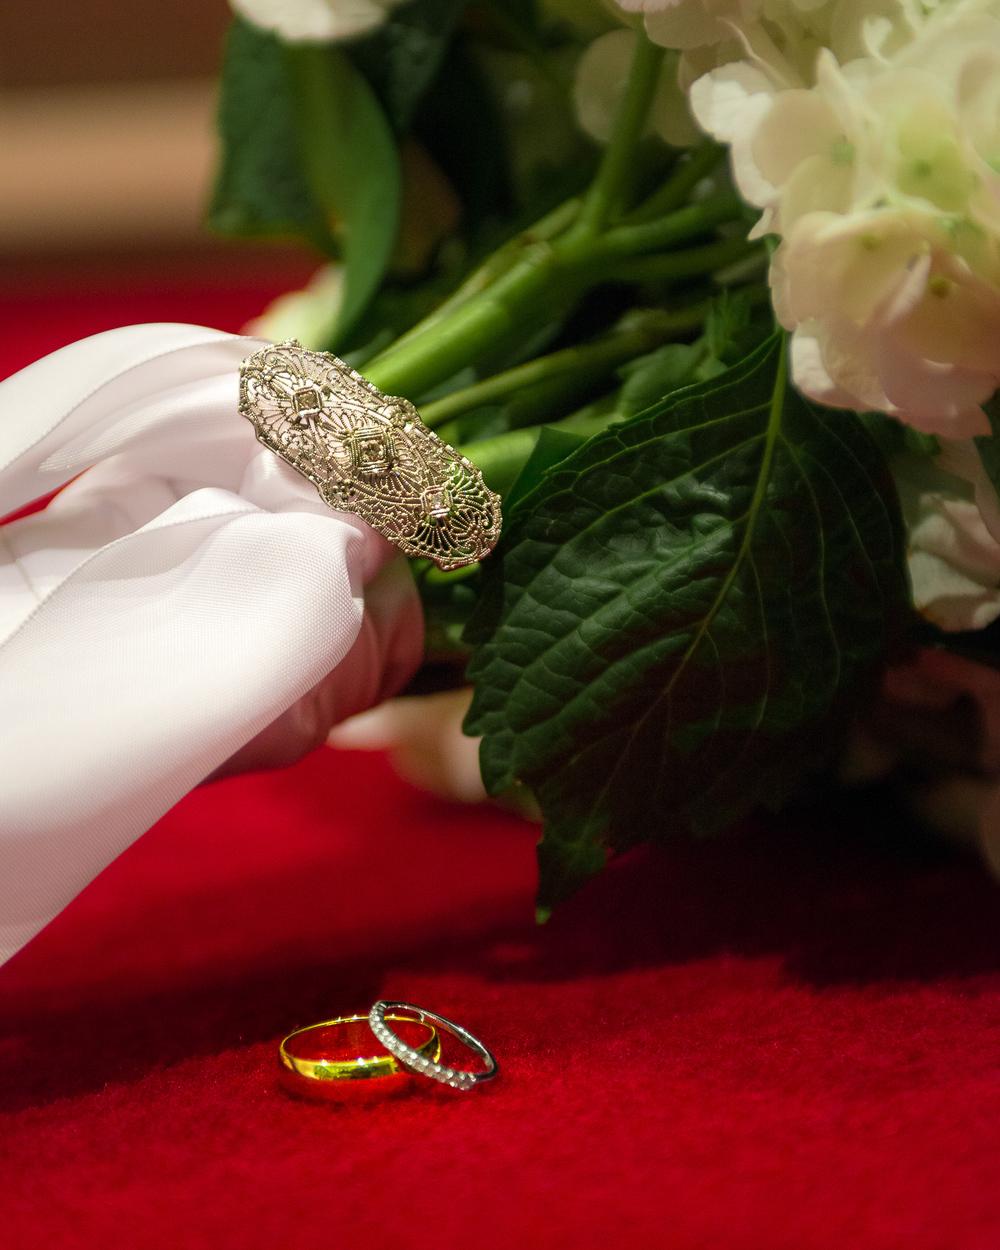 Michael-Napier-Weddings-Cogill-Bizzle-Album-2 (13).jpg